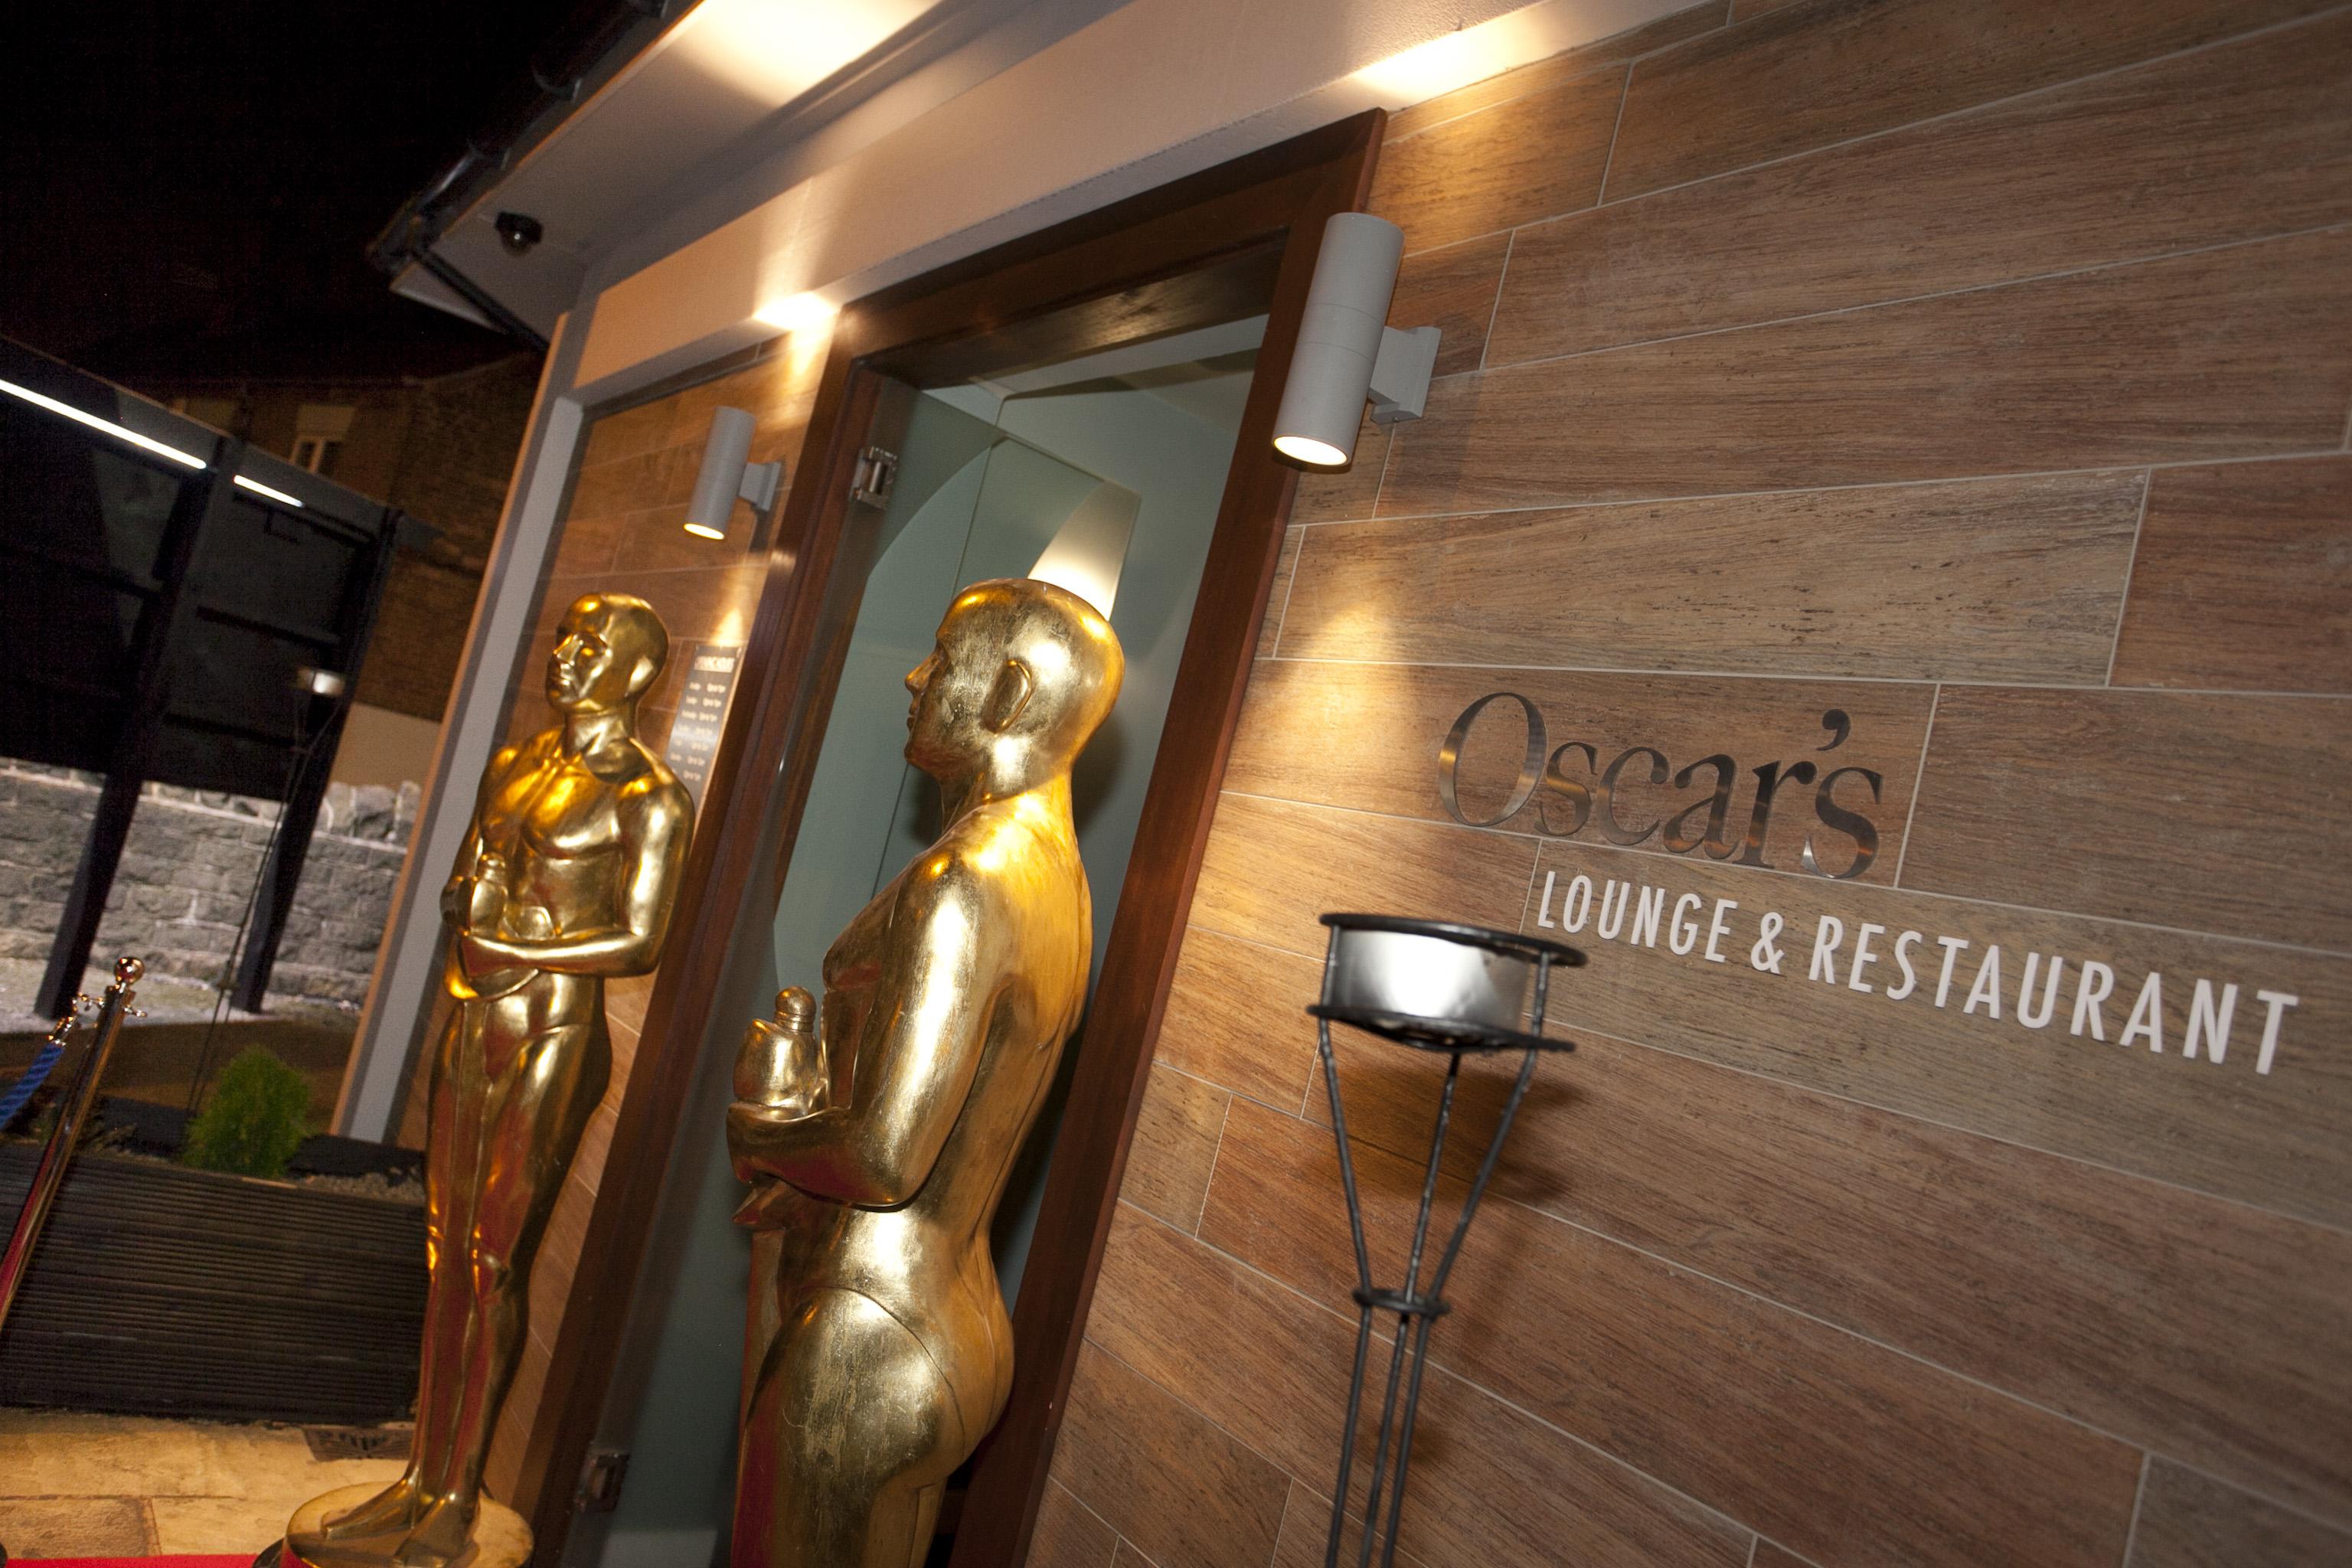 Oscar's Lounge and Restaurant relaunches in Calverton